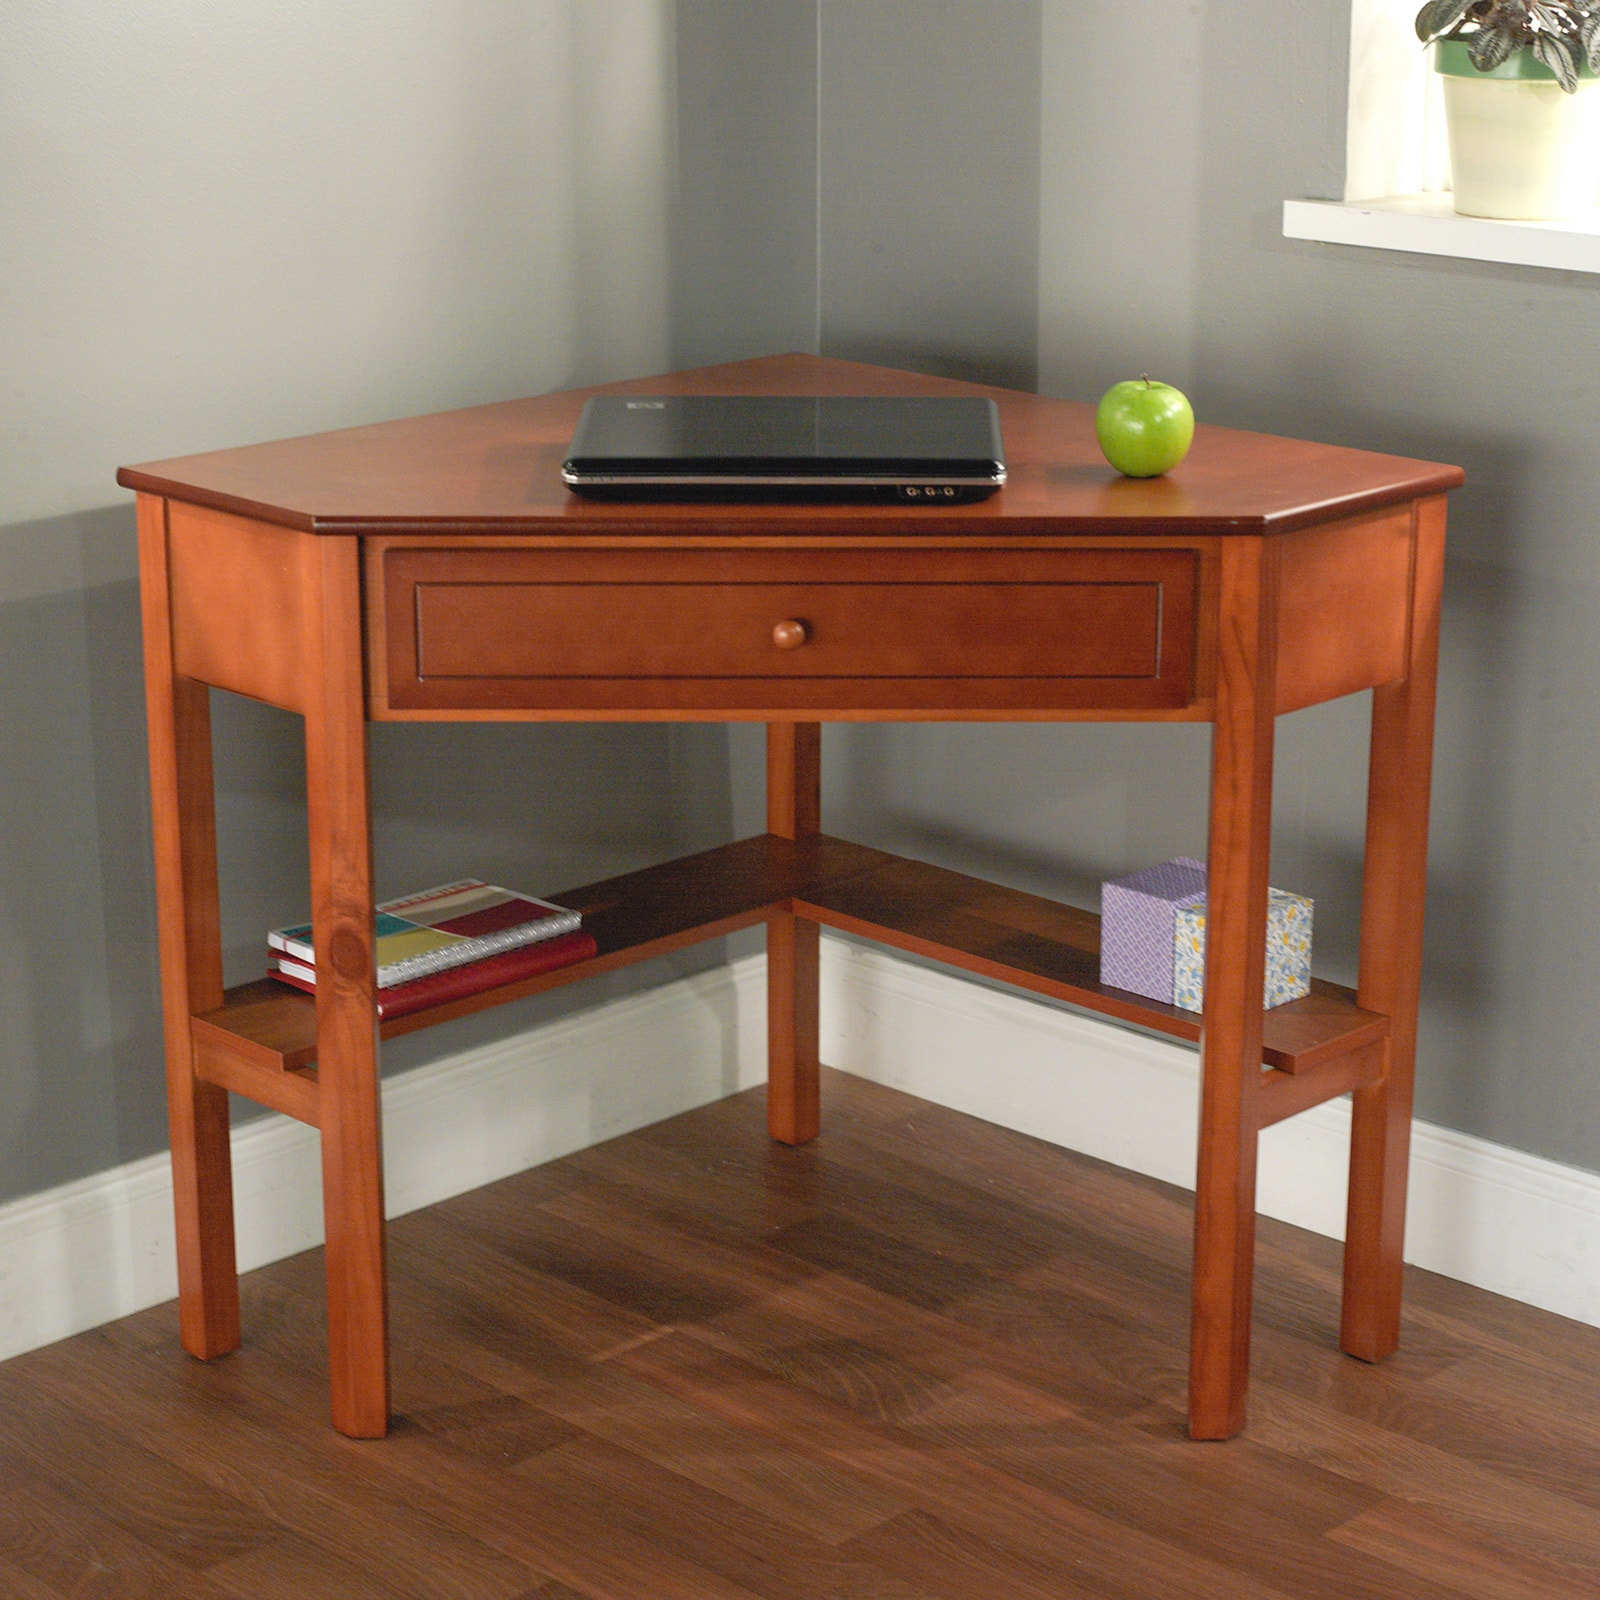 Living Spaces Office Furniture: Simple Living Wood Corner Computer Desk